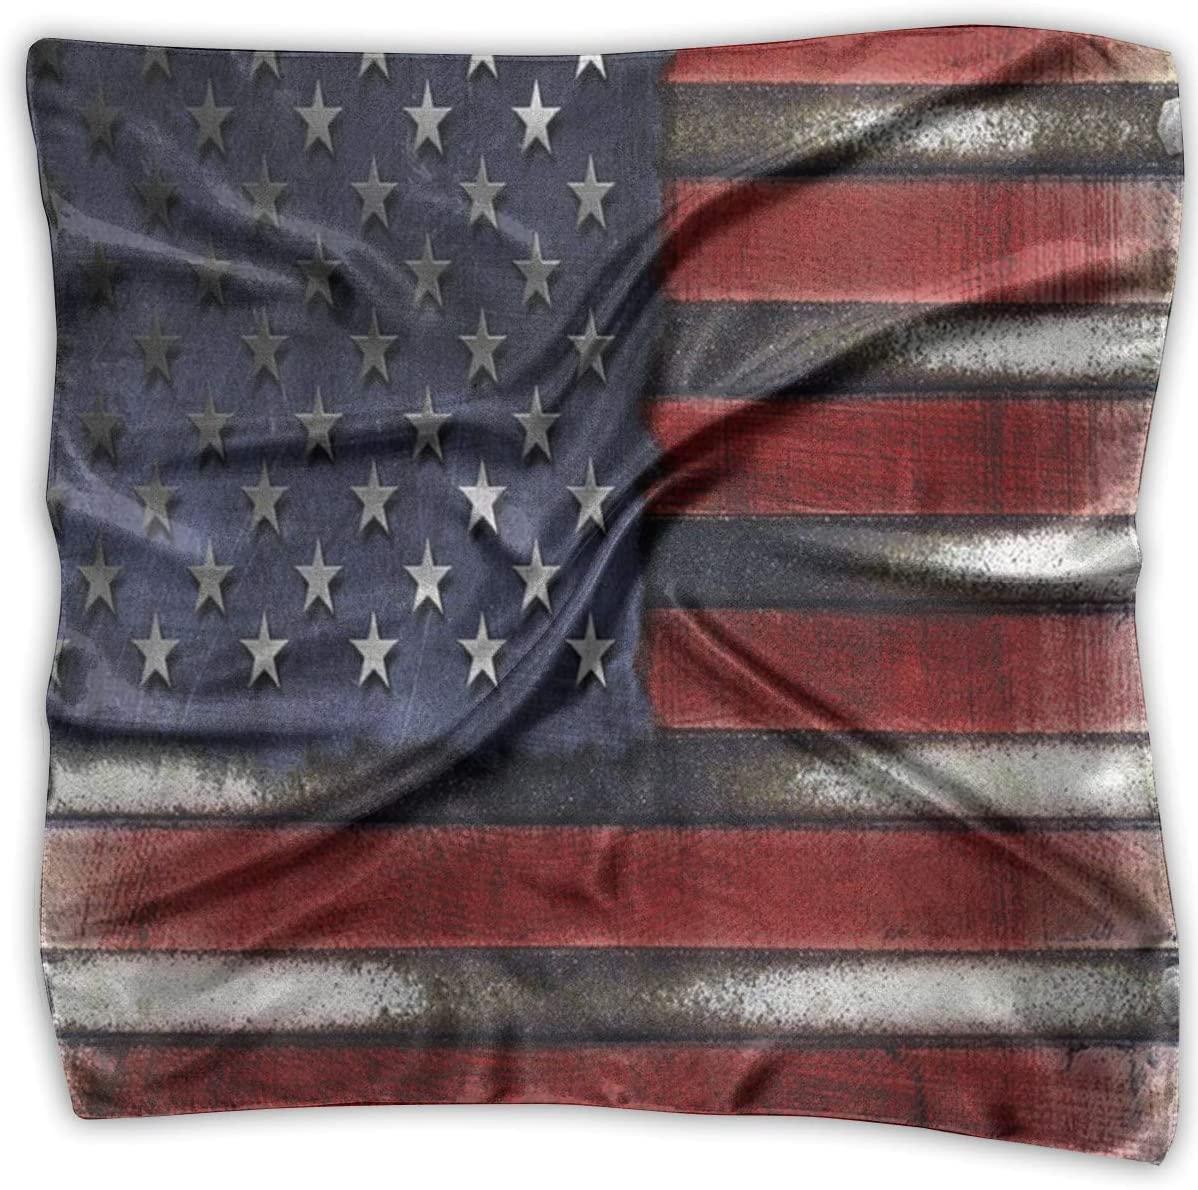 WFIRE Retro American Flag Square Handkerchiefs Scarf Shawl Bandanas Headscarf Neckerchief